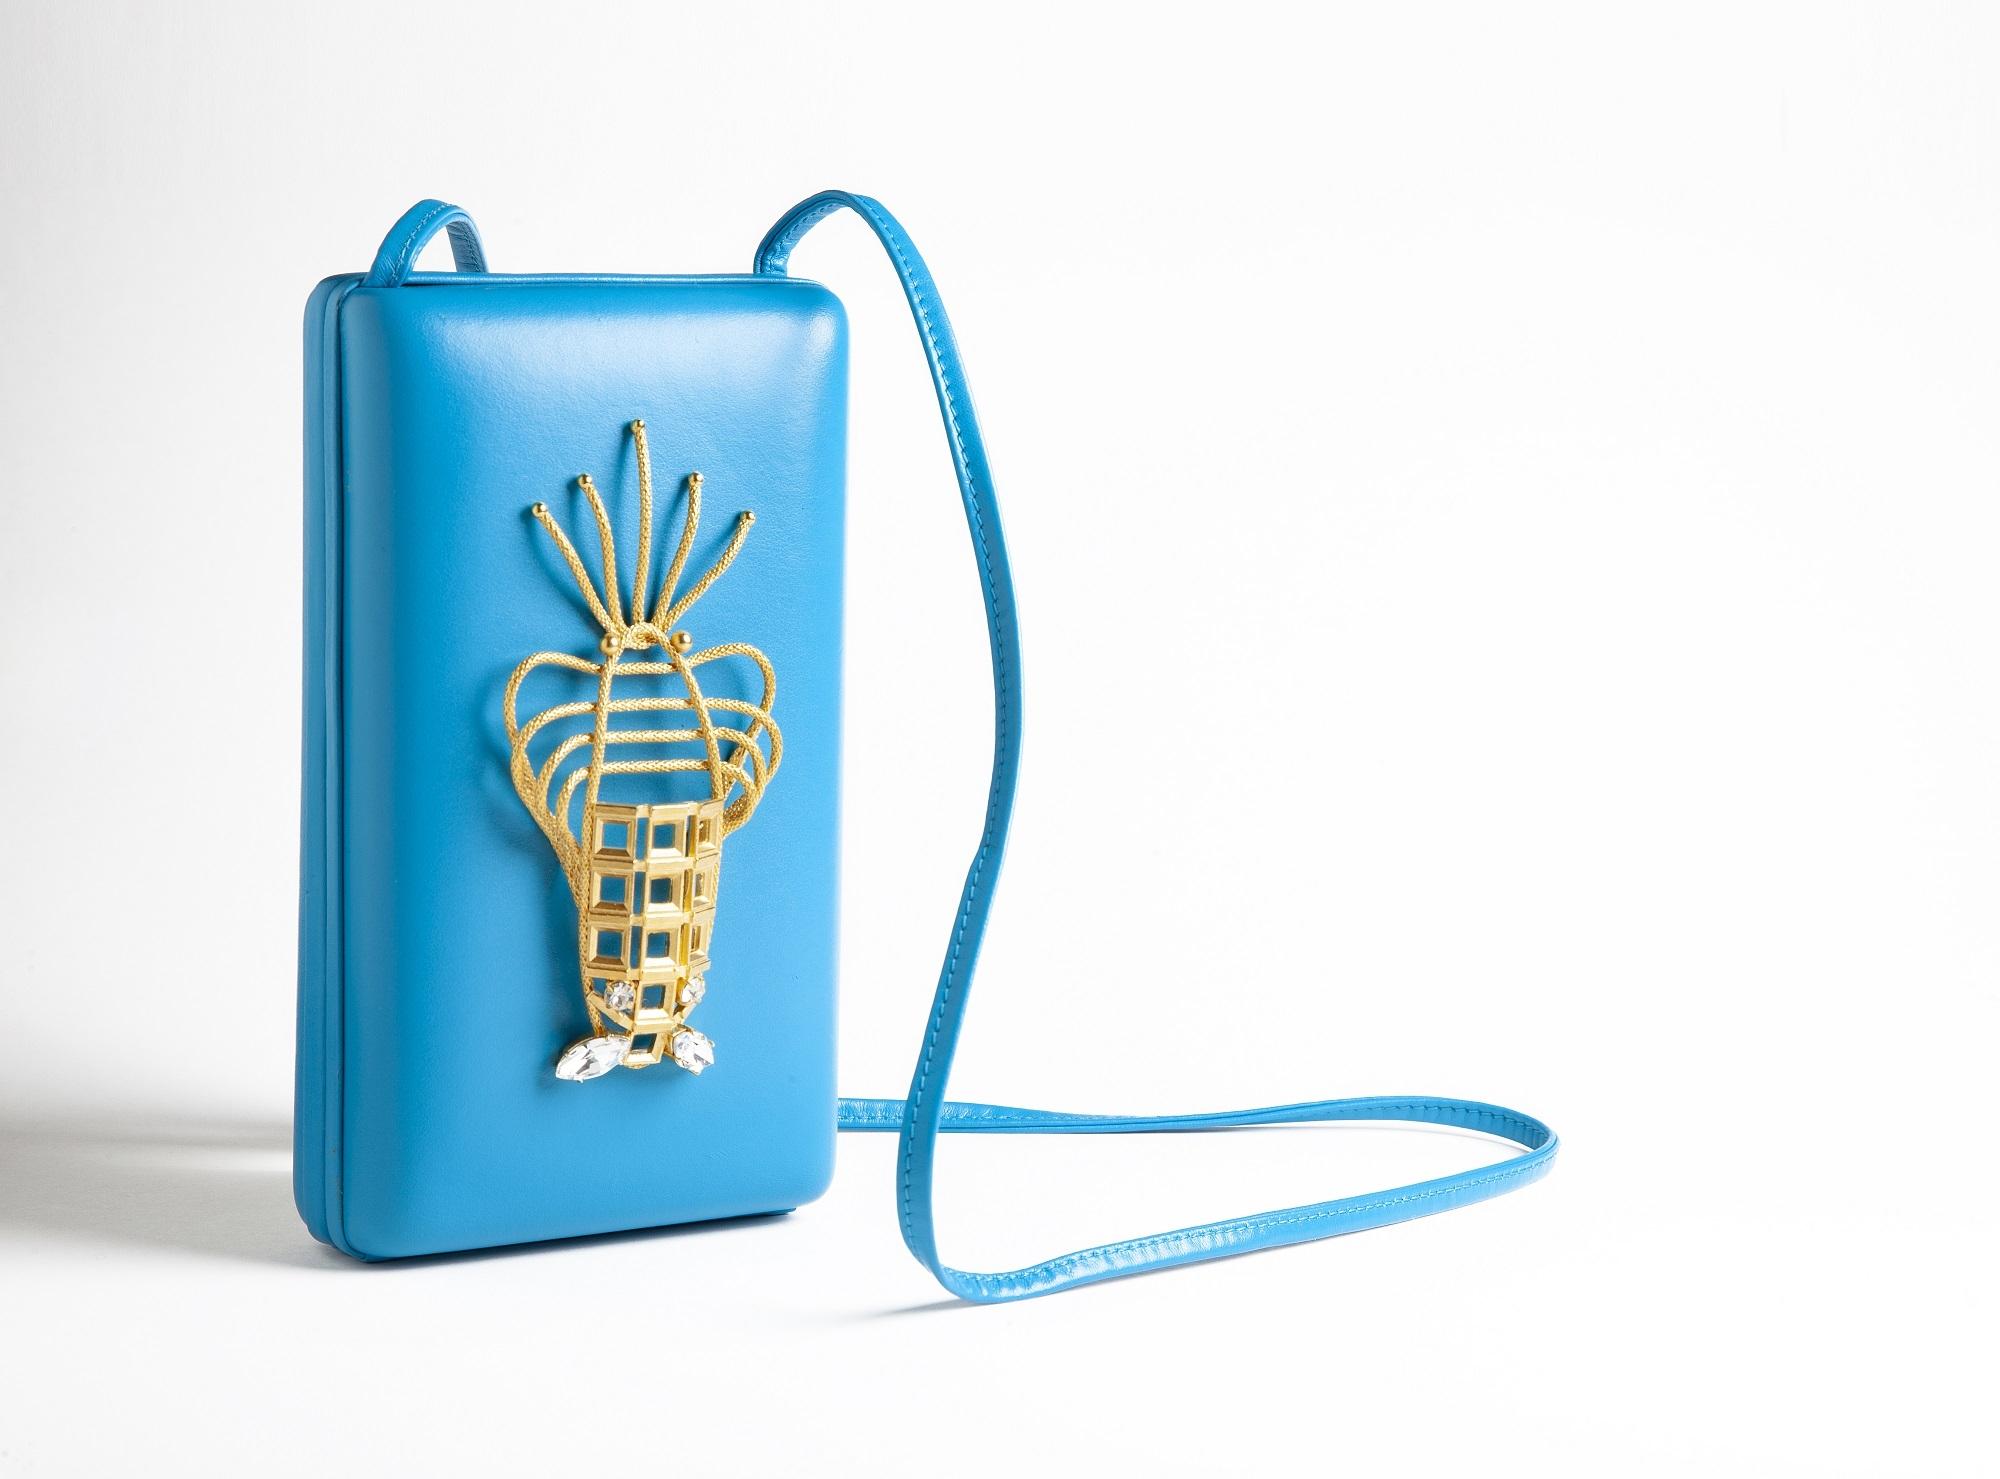 Blue Lobster Luxury Handbag by Sonia Petroff on curated-crowd.com